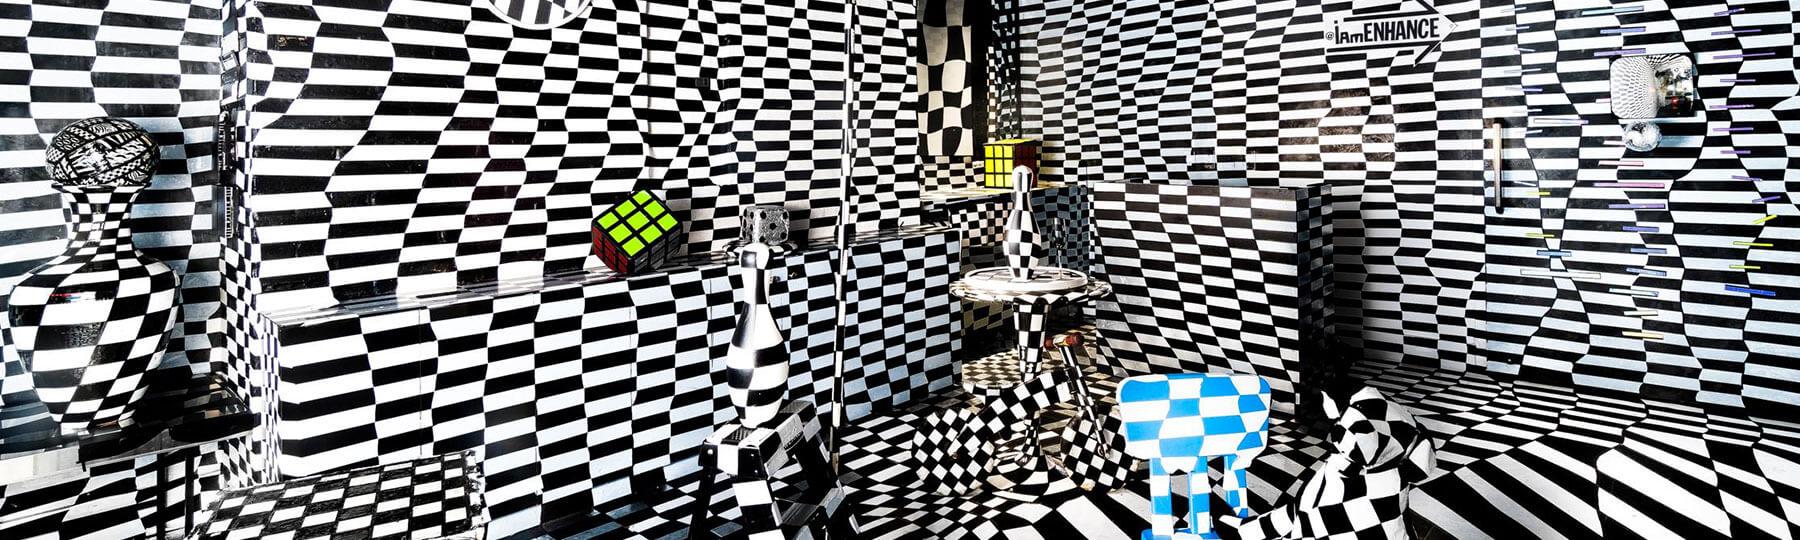 endless chess vandal new york